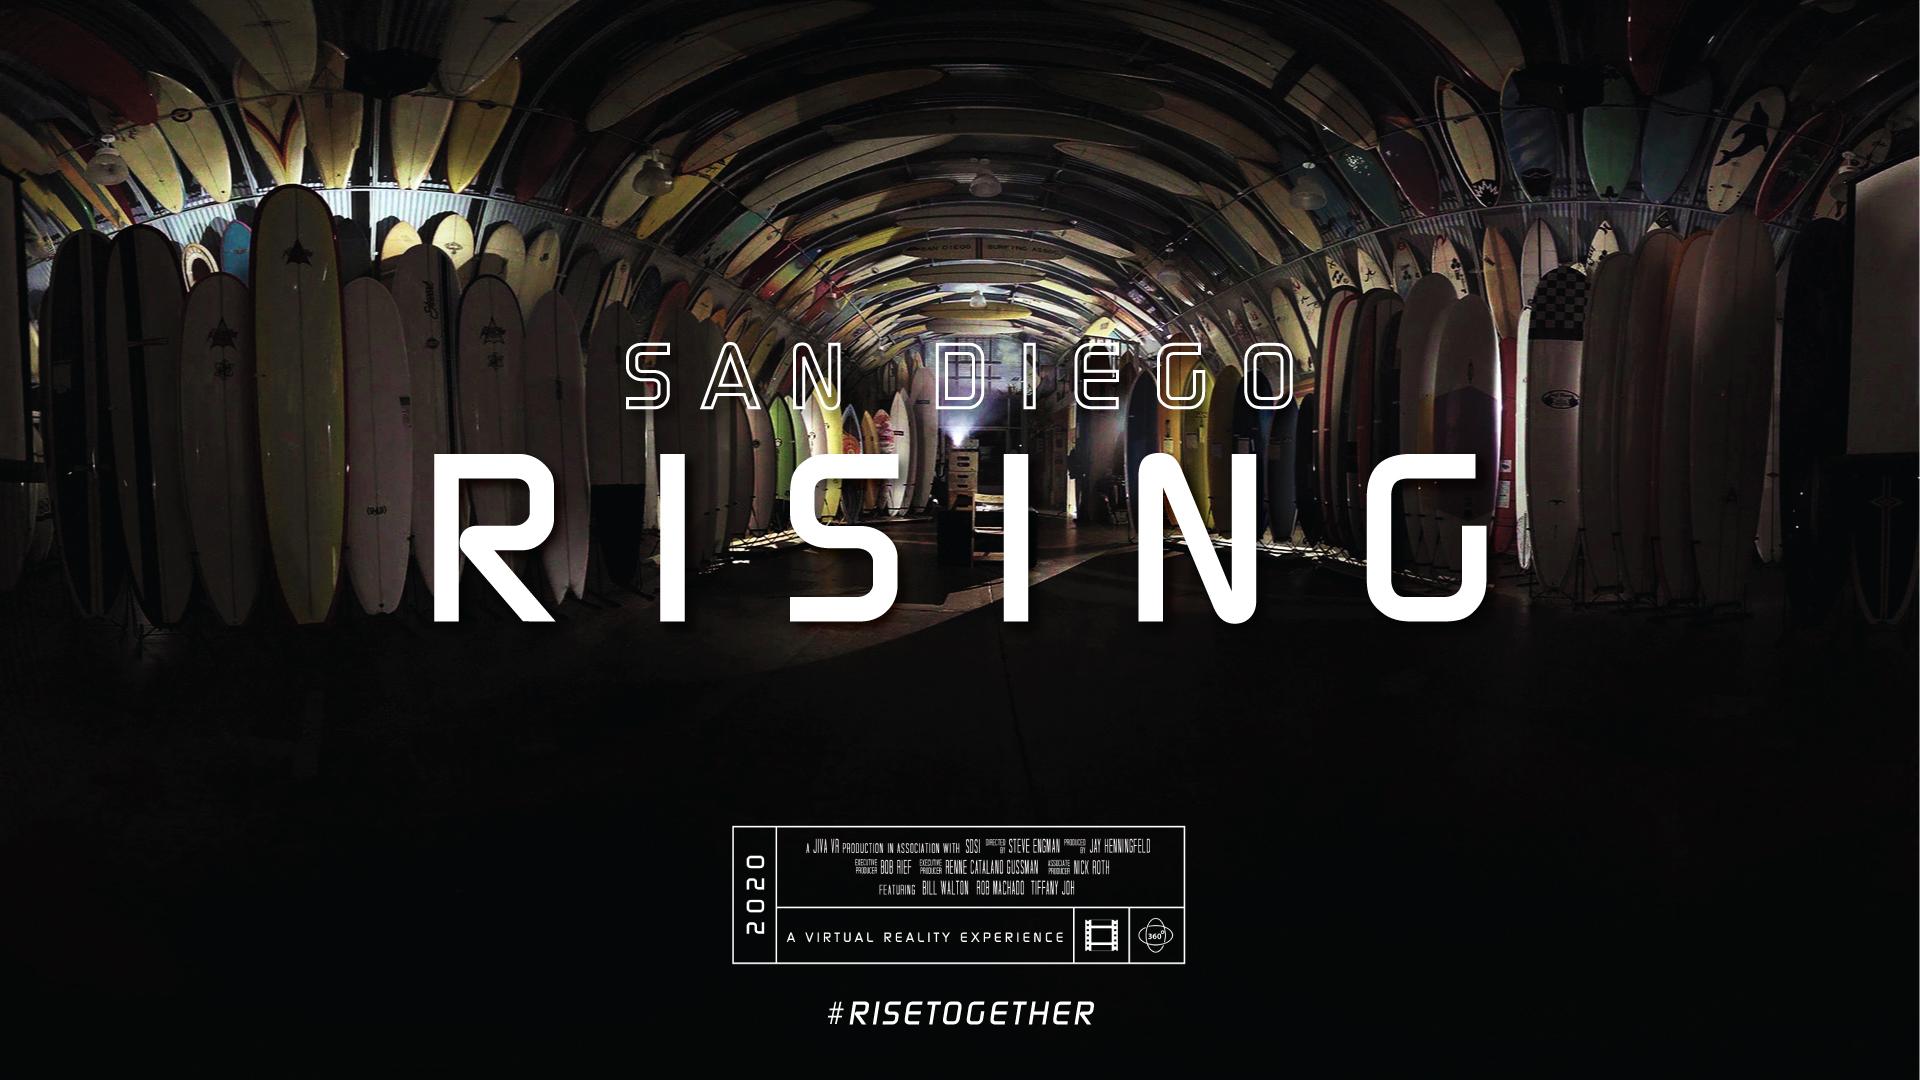 SD RISING 1920x1080 Banner